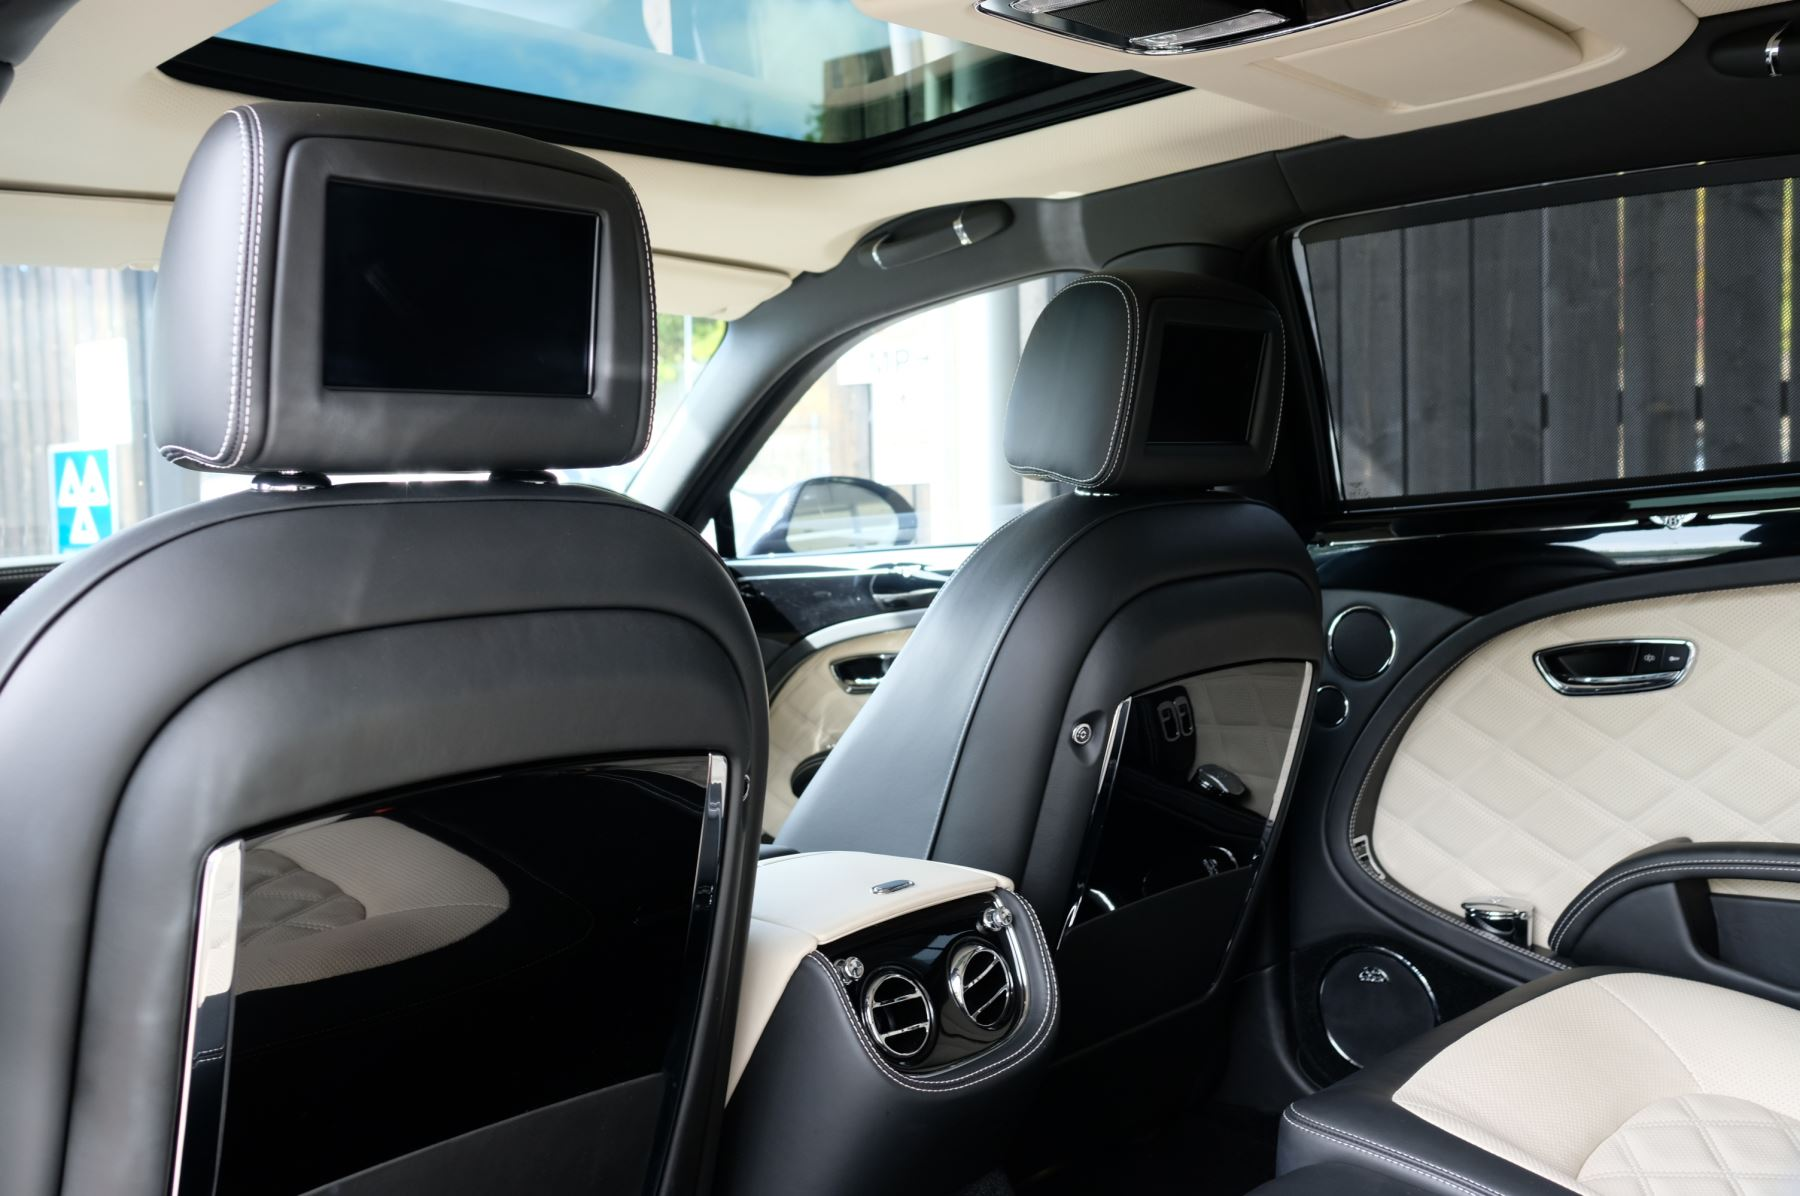 Bentley Mulsanne 6.8 V8 Speed image 14